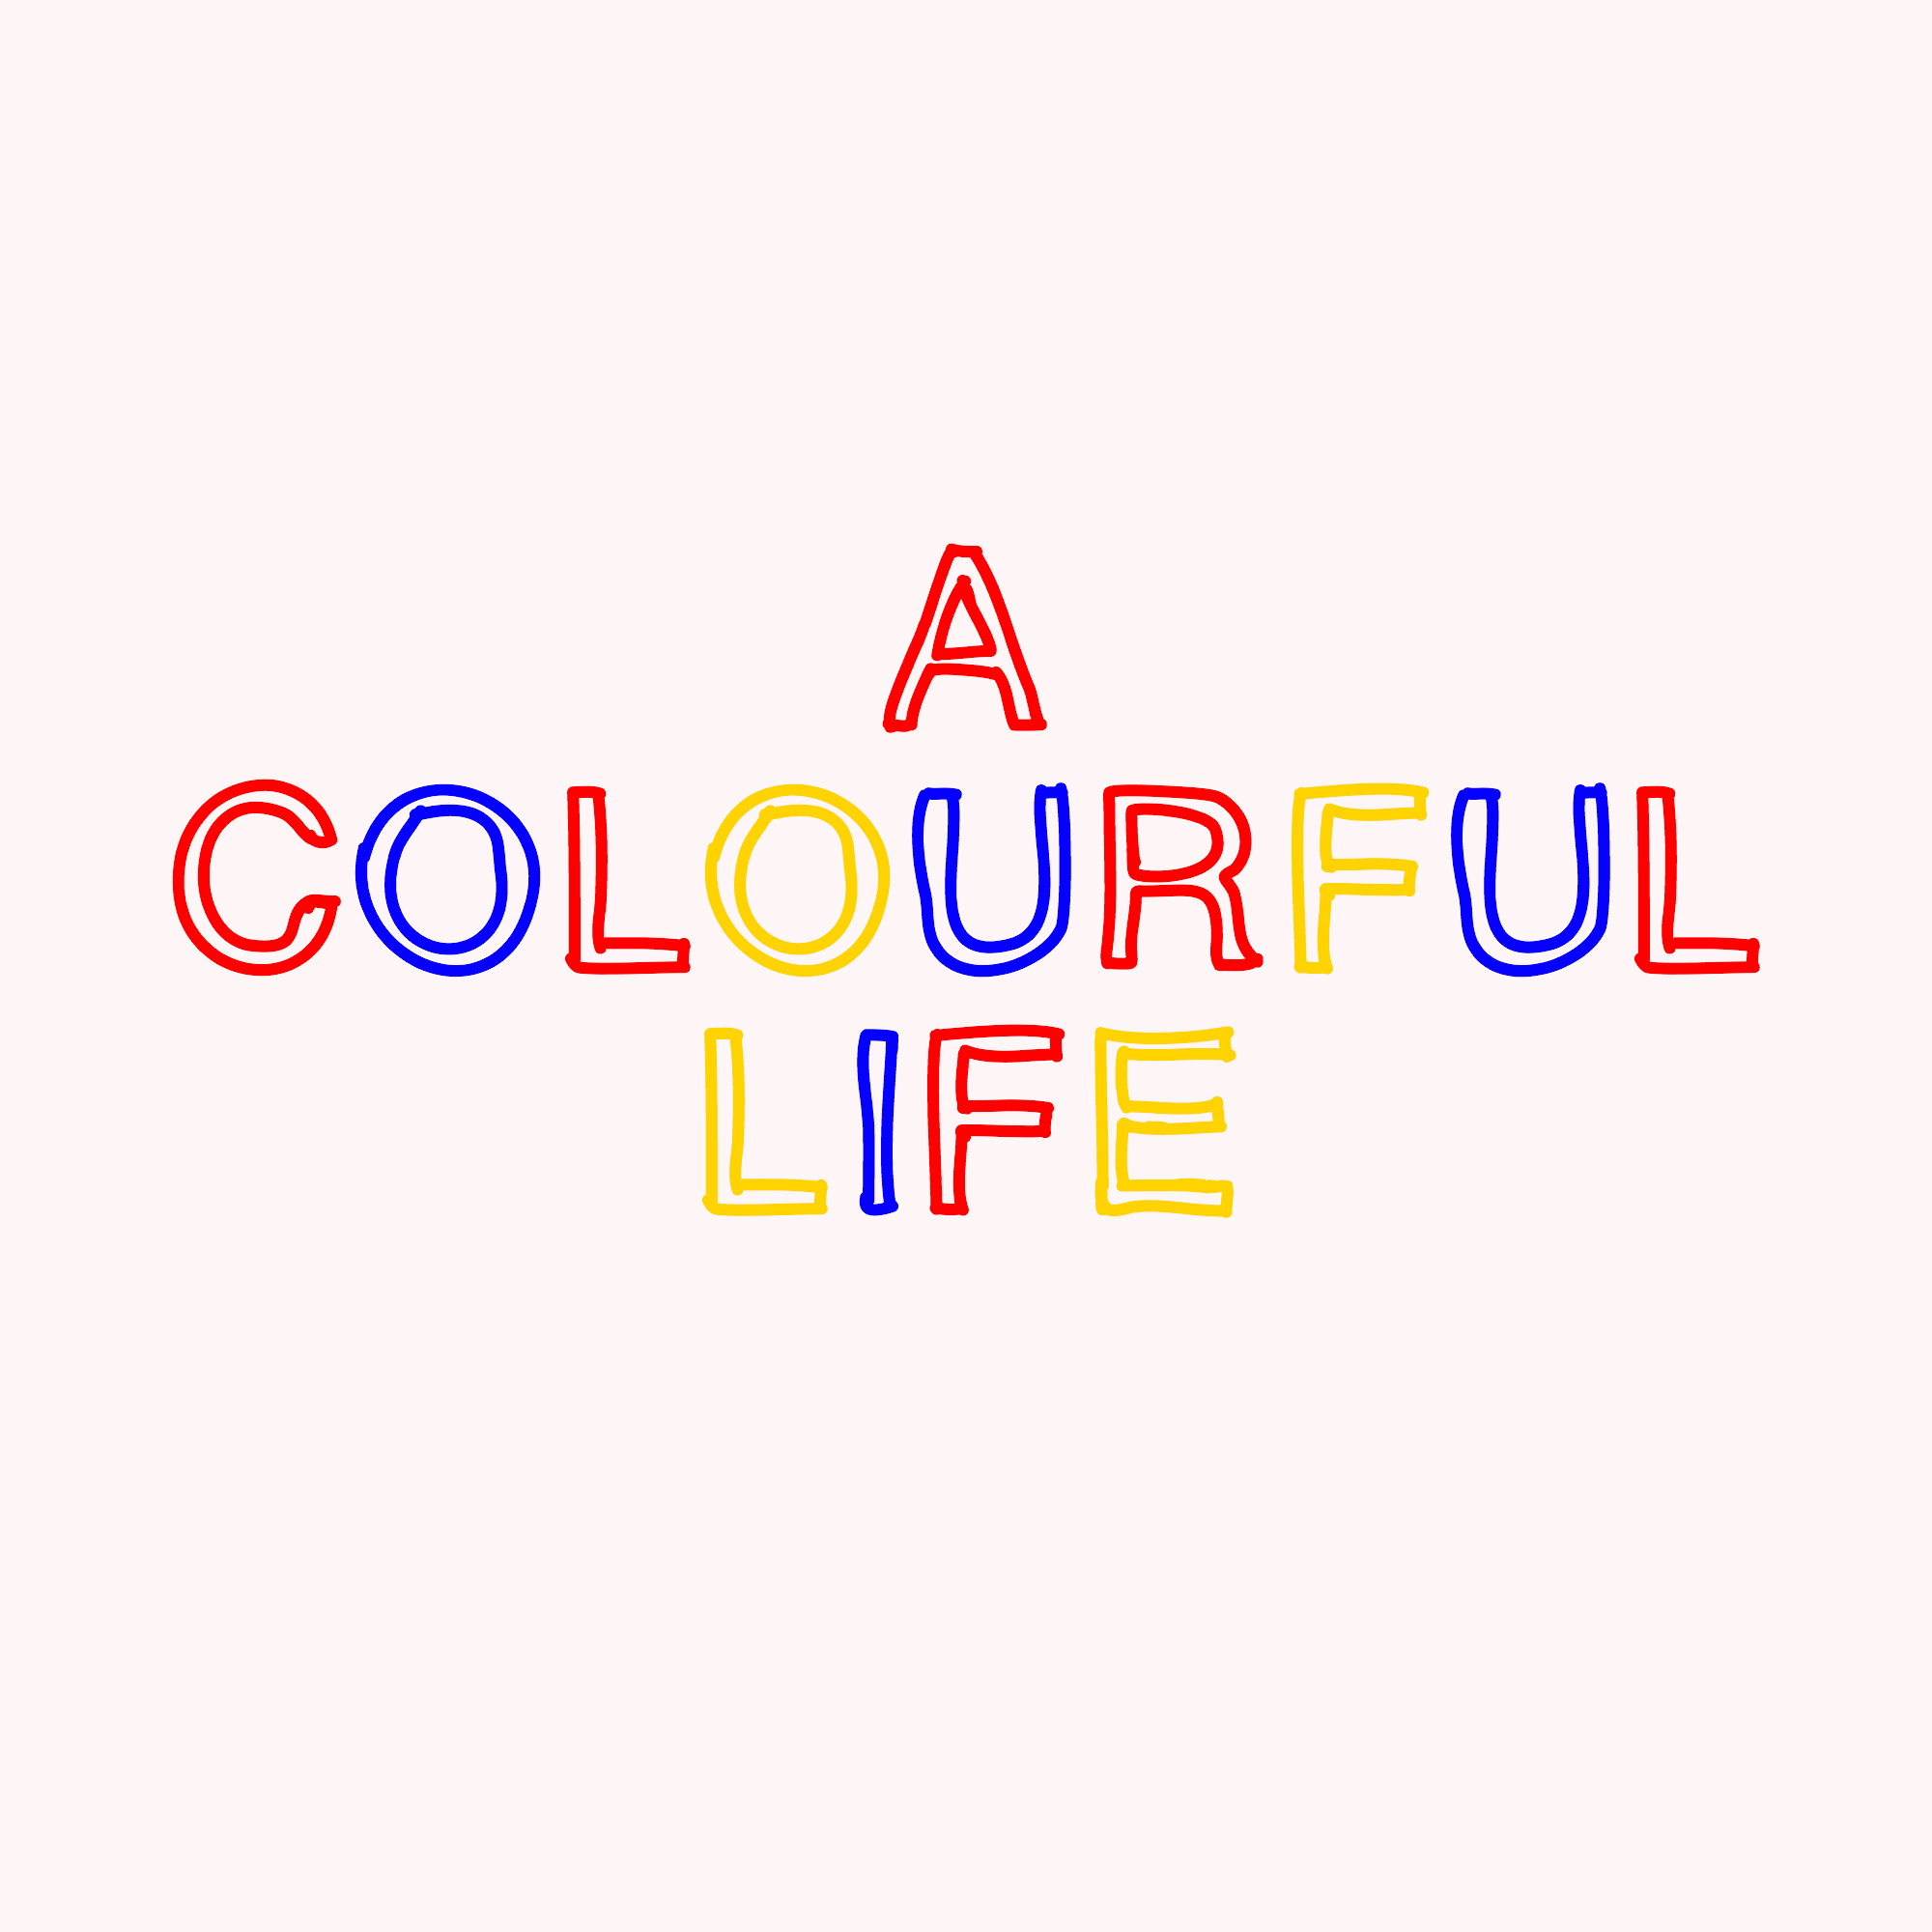 colourful life font.jpg